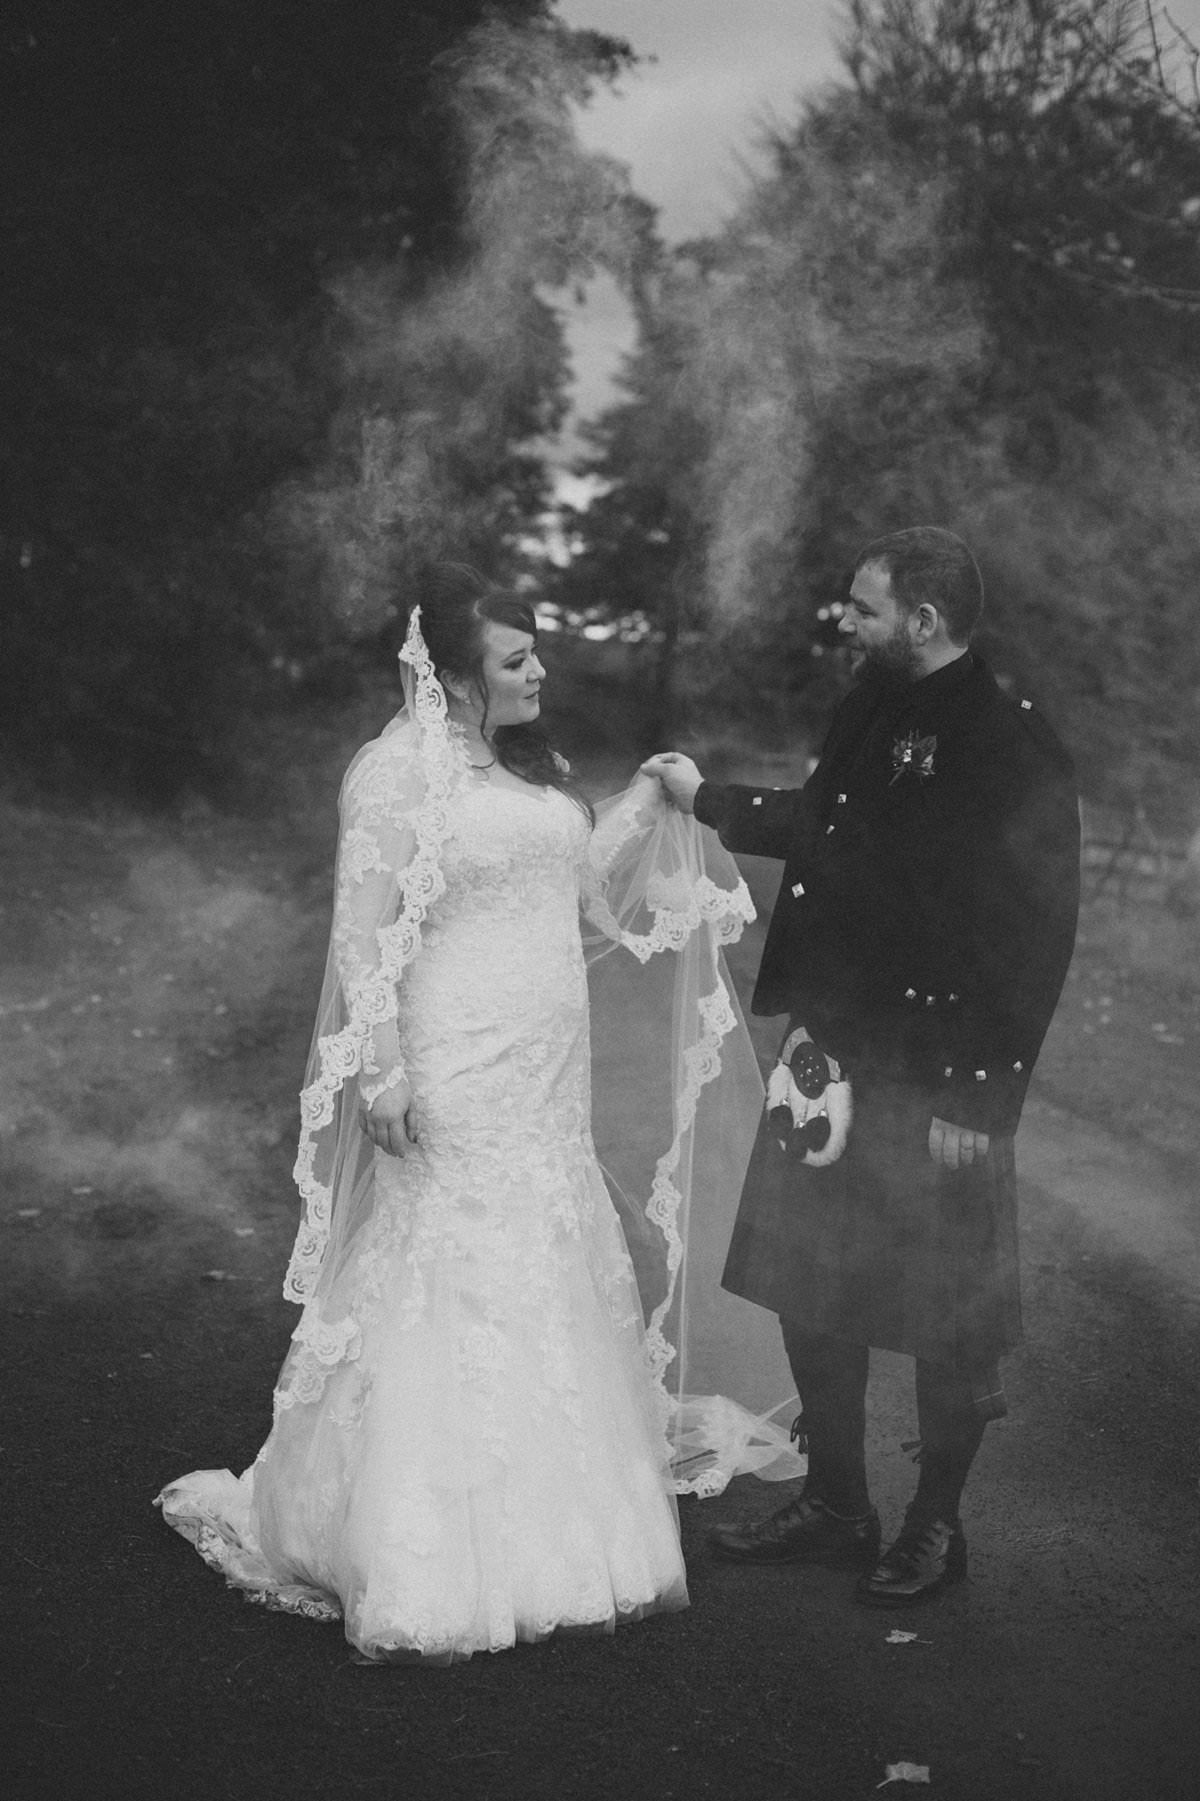 fine-art-wedding-photography-edinburgh-rosslyn-oxenfoord-castle-135